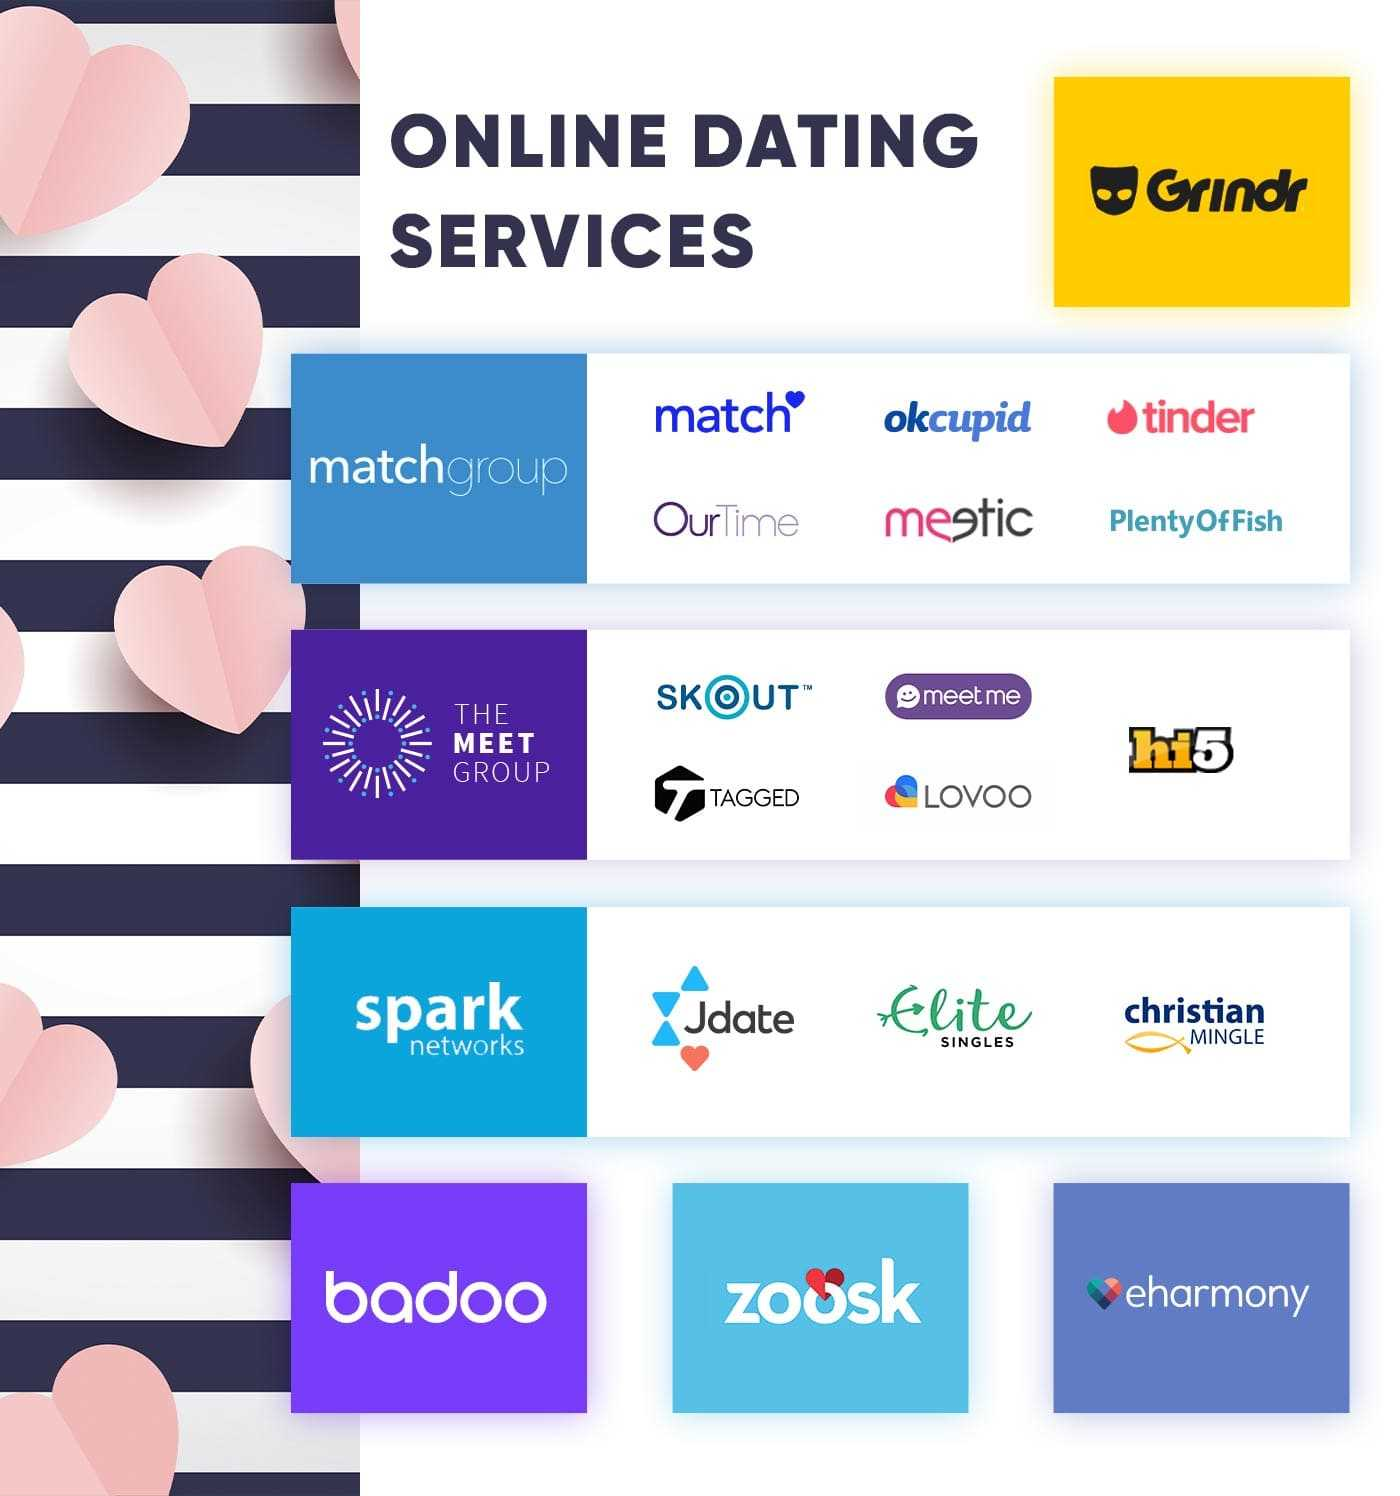 Dating Site Lovoo Badoo